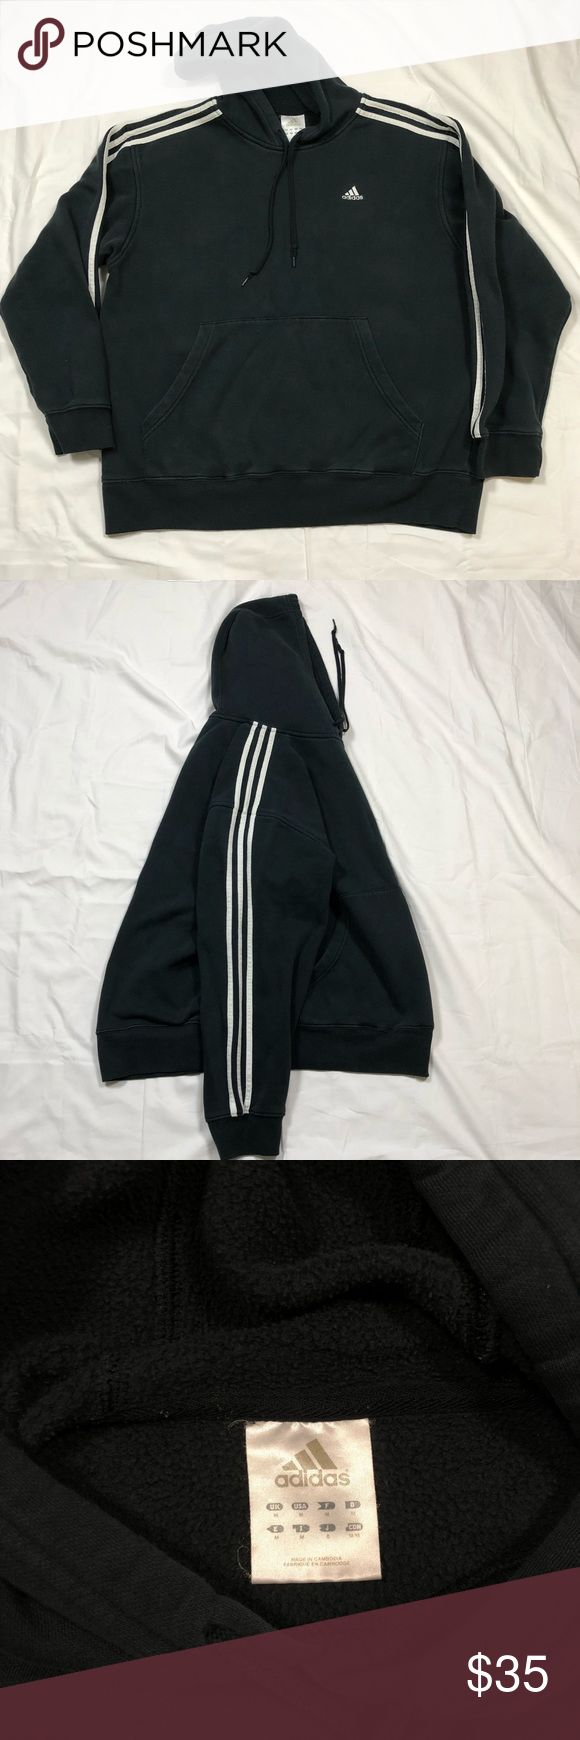 Adidas Hoodie - Men's (M) - Used  - Good condition  - Some signs of wear  NGE32614 adidas Shirts Sweatshirts & Hoodies